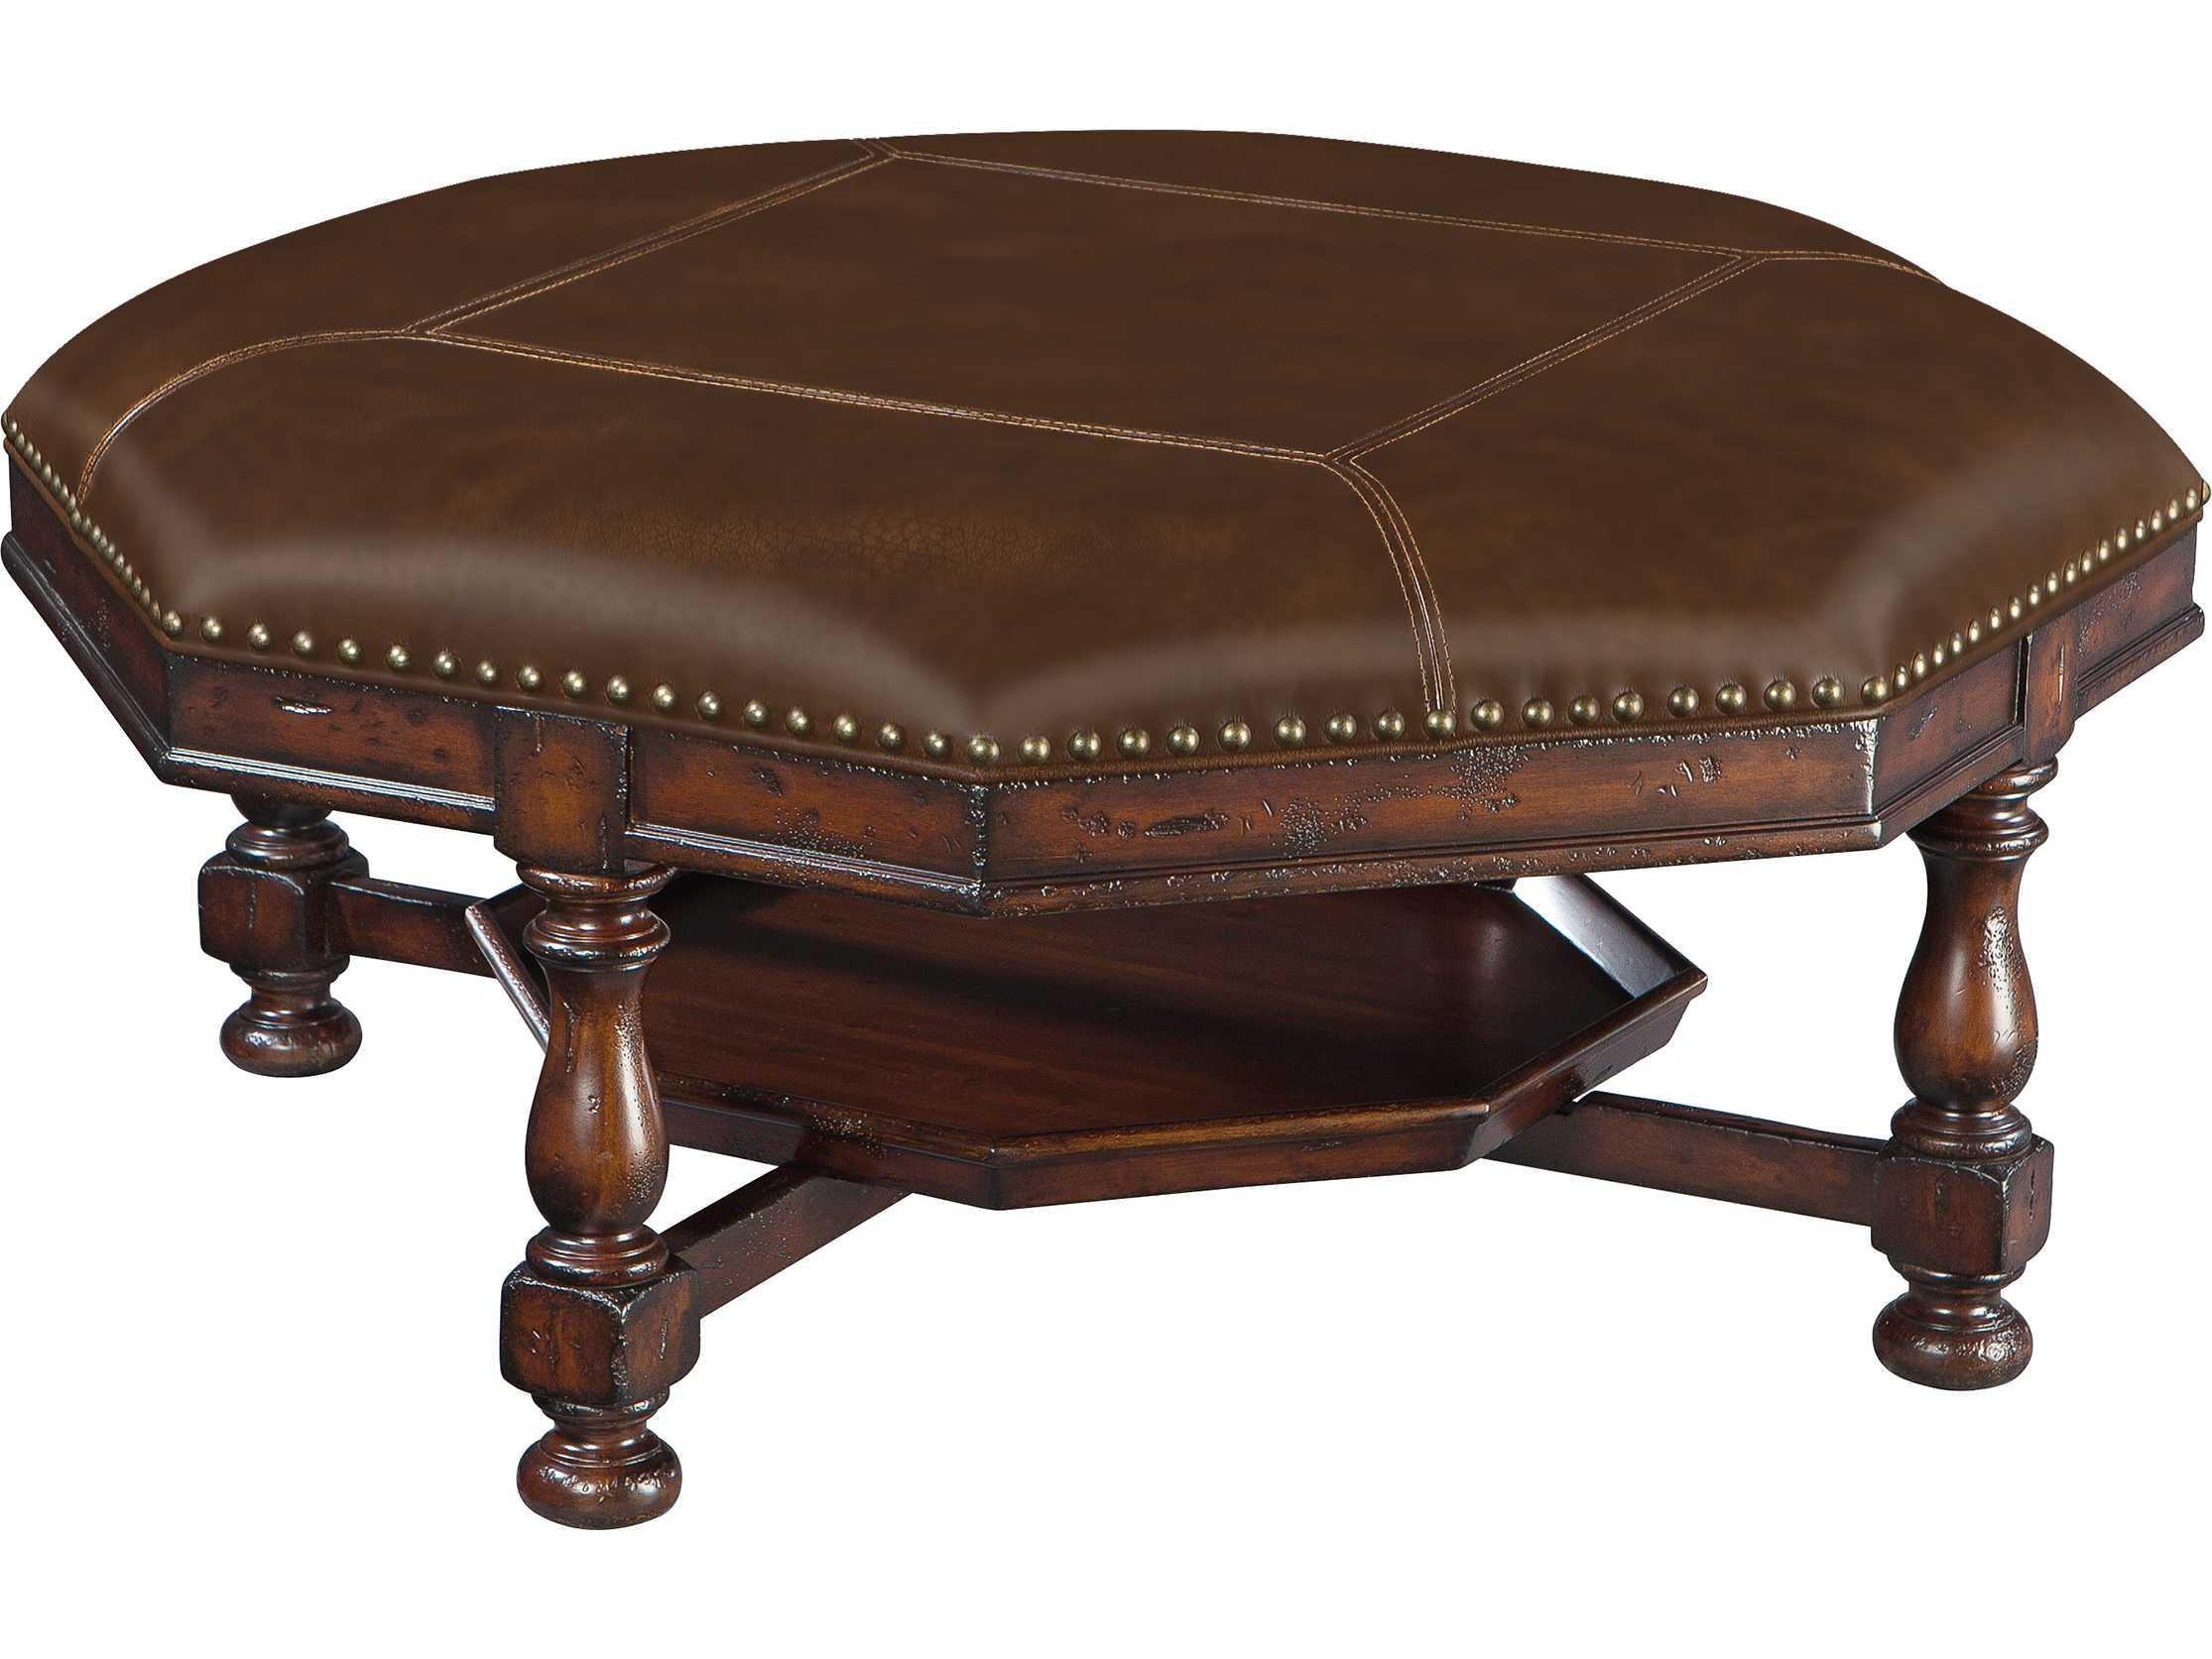 hekman havana antique coffee table ottoman hk81248. Black Bedroom Furniture Sets. Home Design Ideas